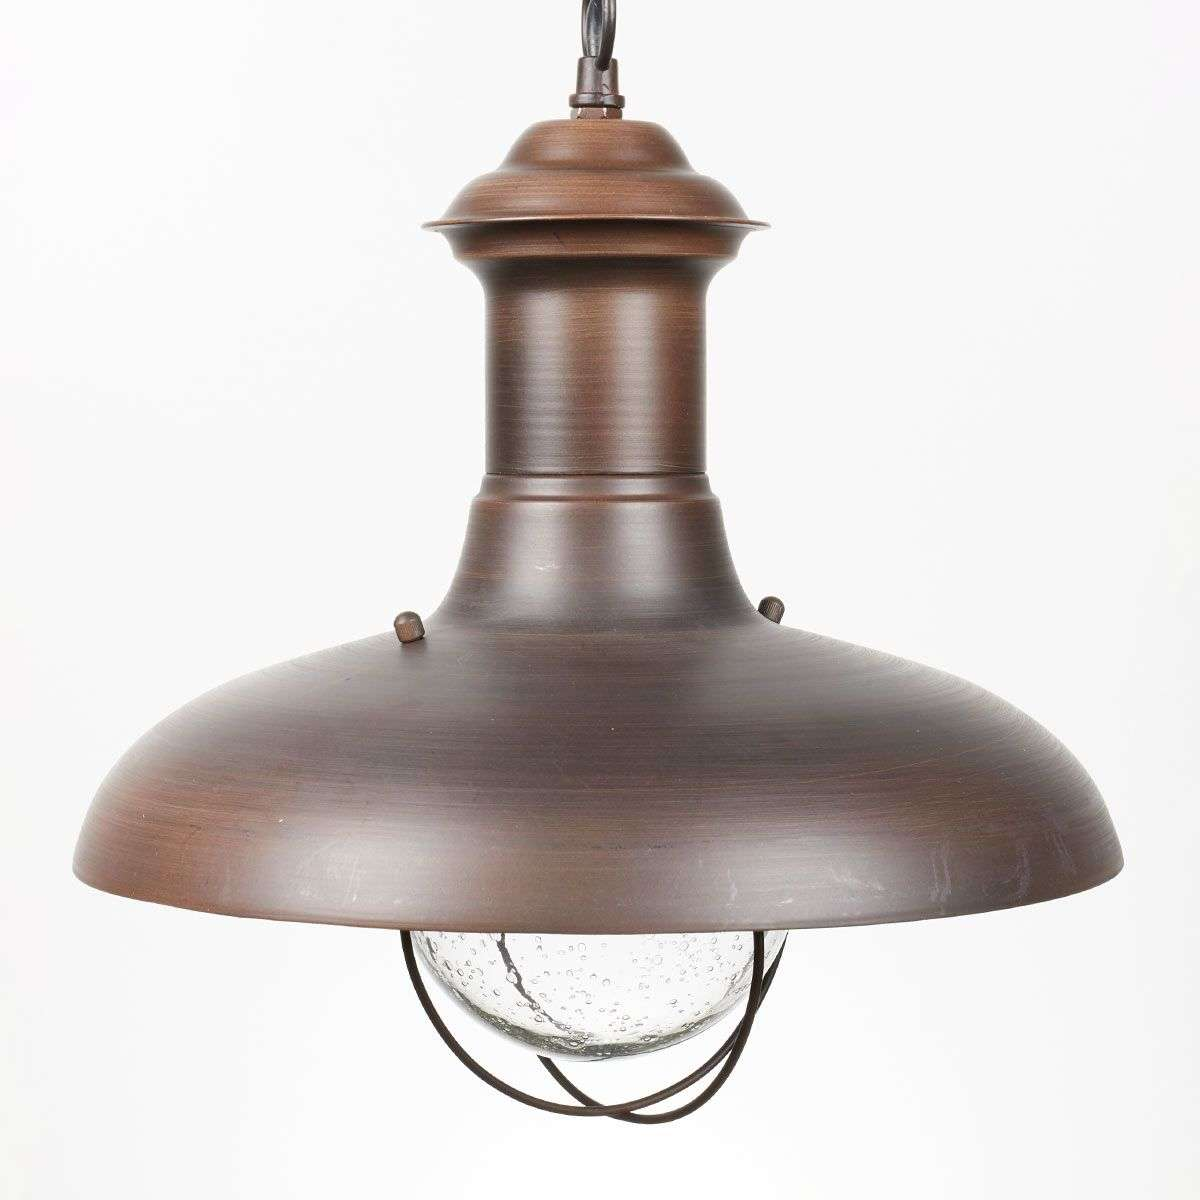 ESTORIL-G Oxide Brown Exterior Pendant Lamp   Lights.ie